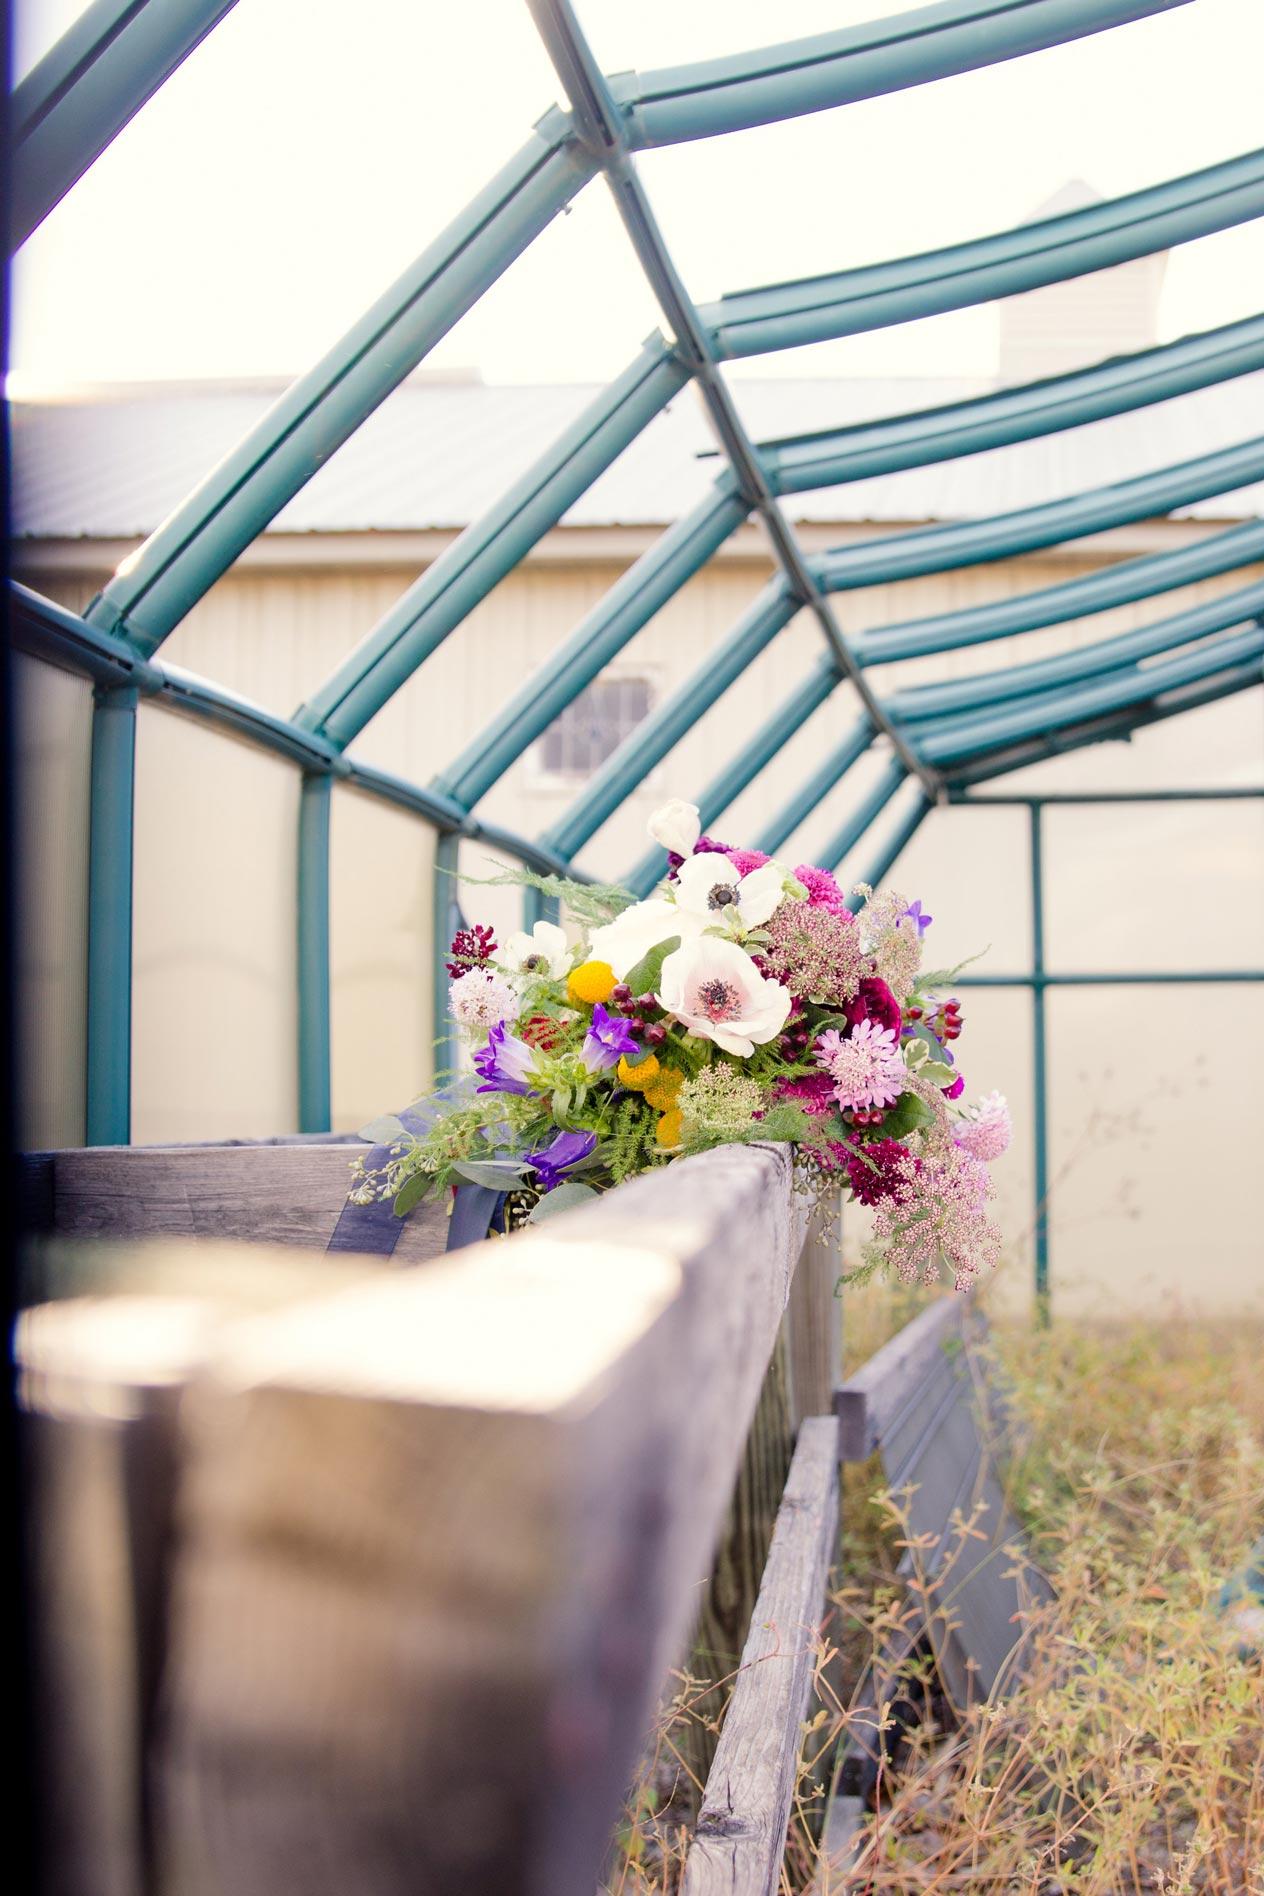 Rustic-Whimsical-Wedding- Tulsa-Wedding-FloristRobyns-Flower-Garden_Mallory-Hall-Photography14.jpg